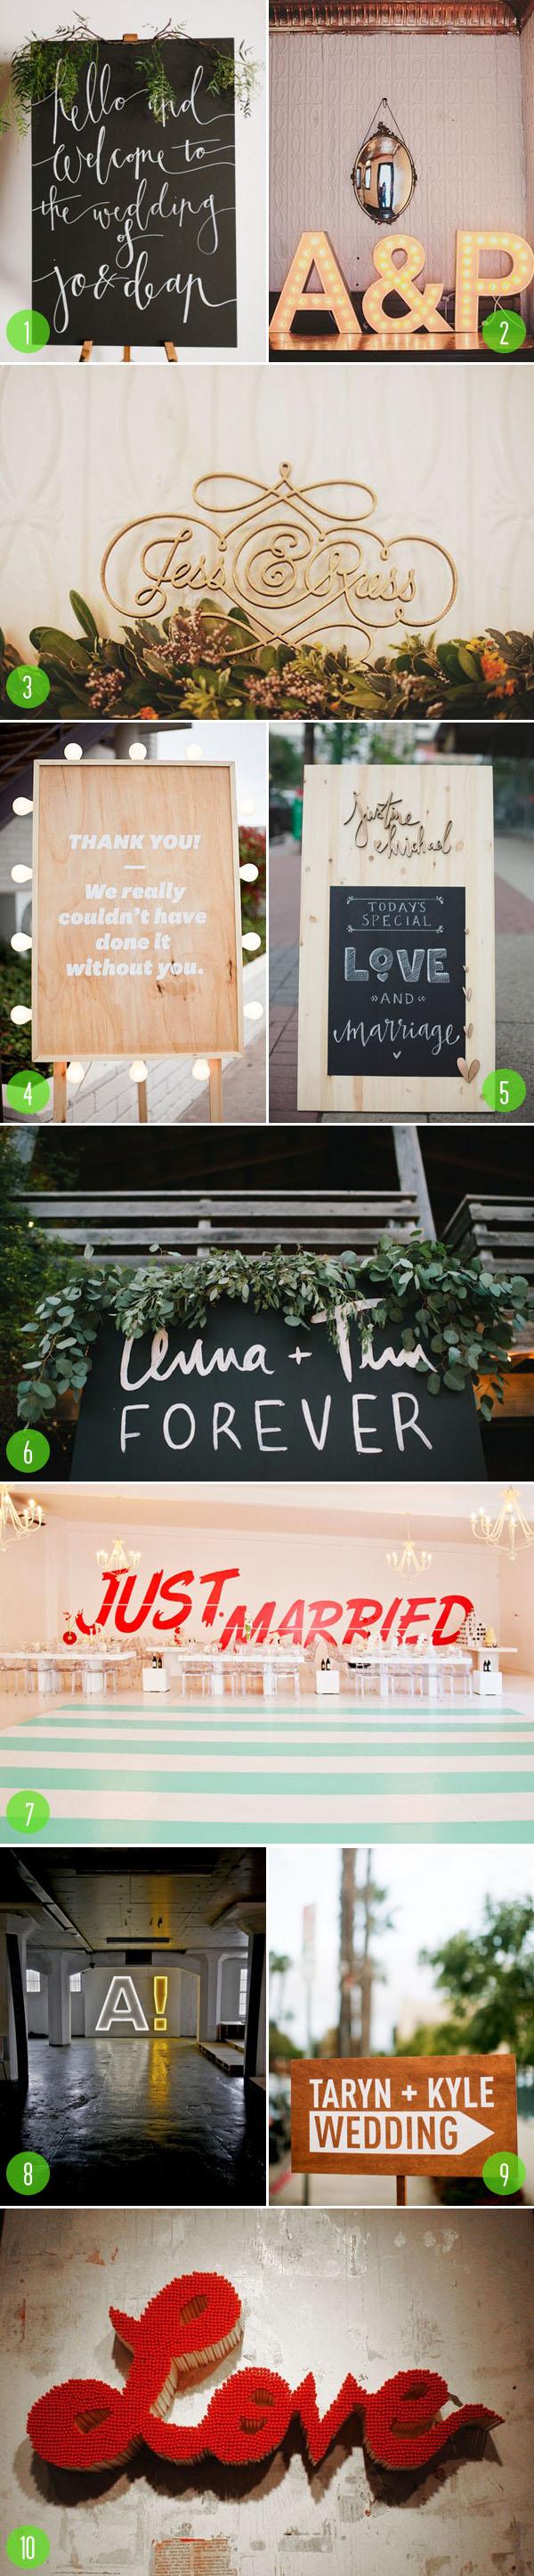 top 10: signage 2